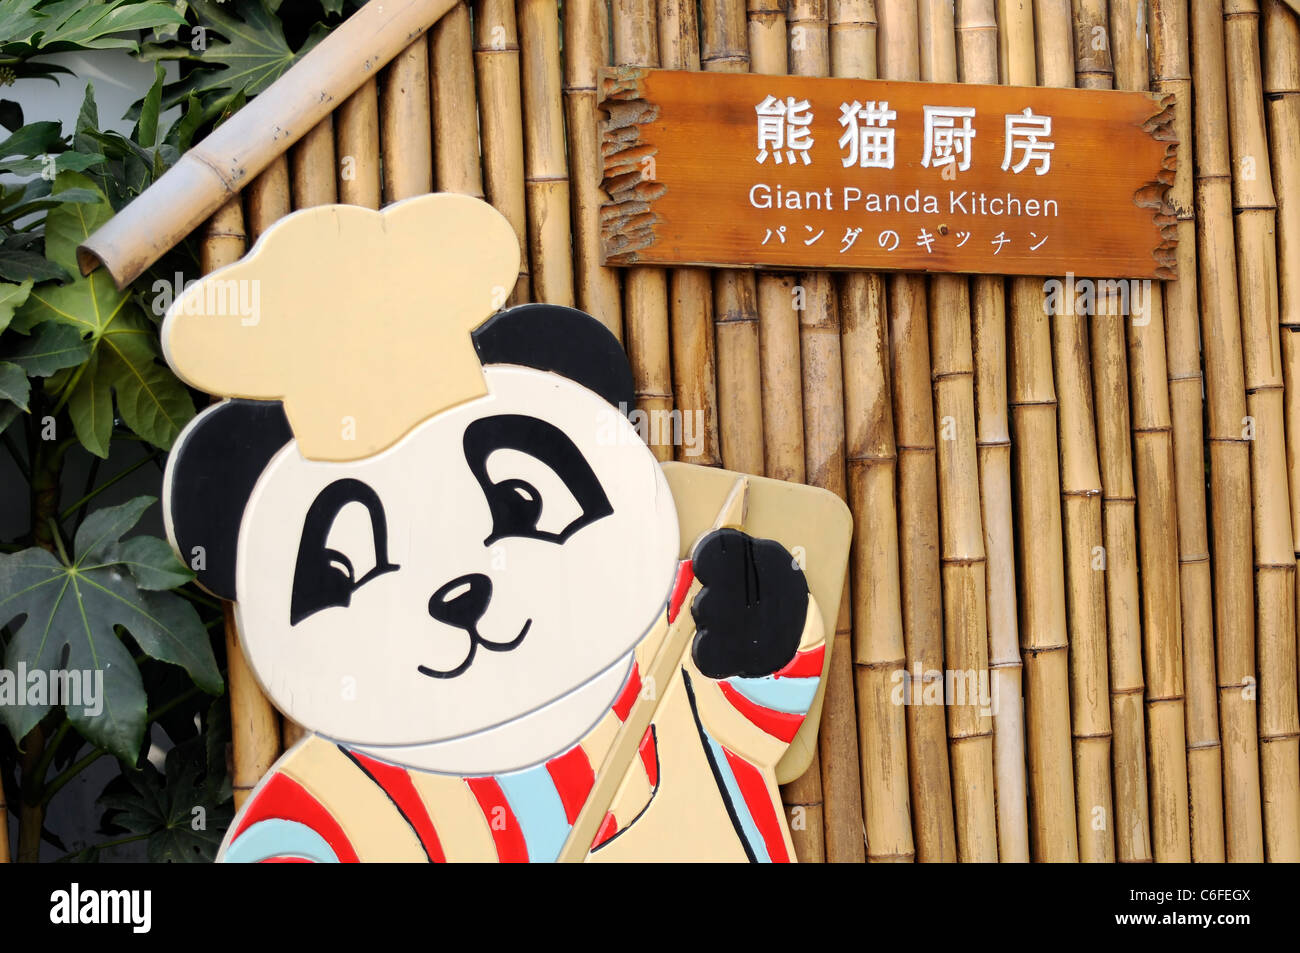 Giant Panda Kitchen Sign At The Chengdu Research Base Of Giant Panda  Breeding, Chengdu, China